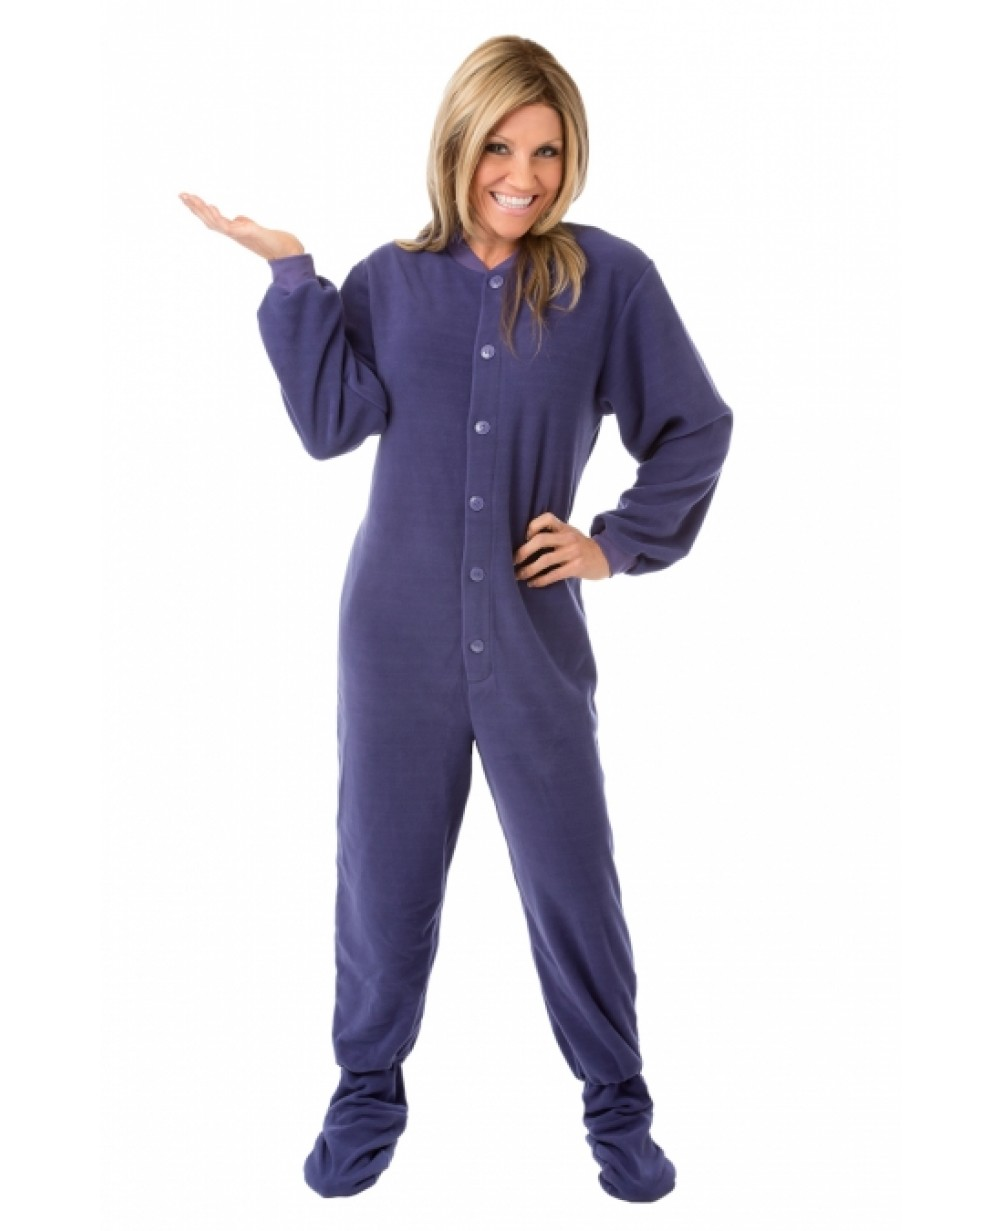 Adult pajamas with feet